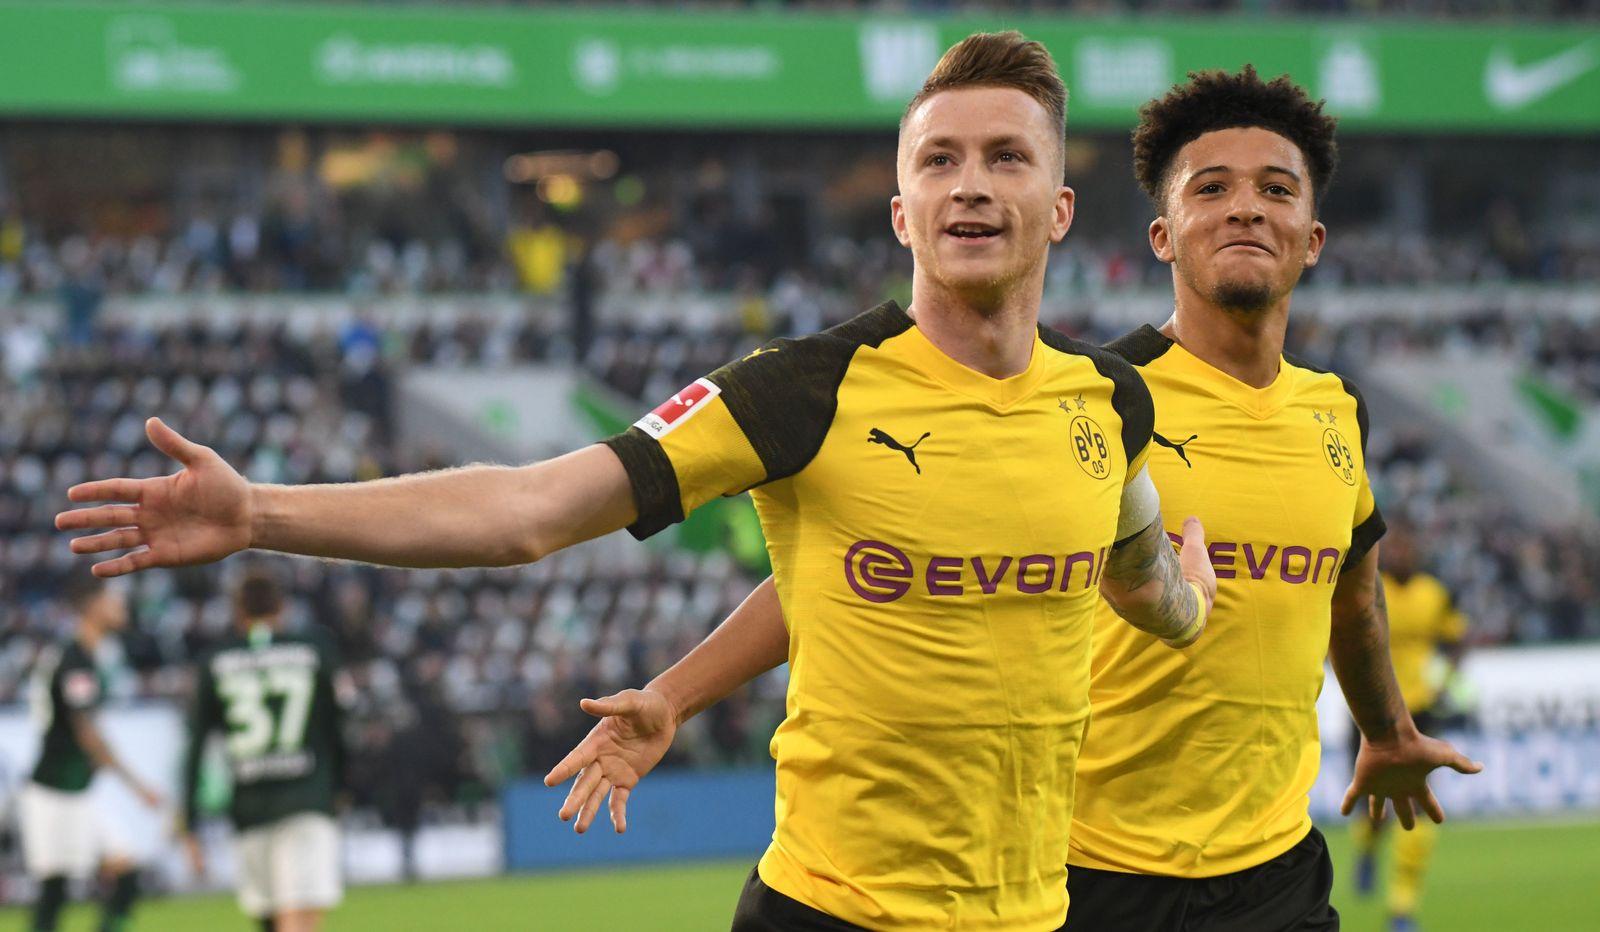 VfL Wolfsburg - Borussia Dortmund